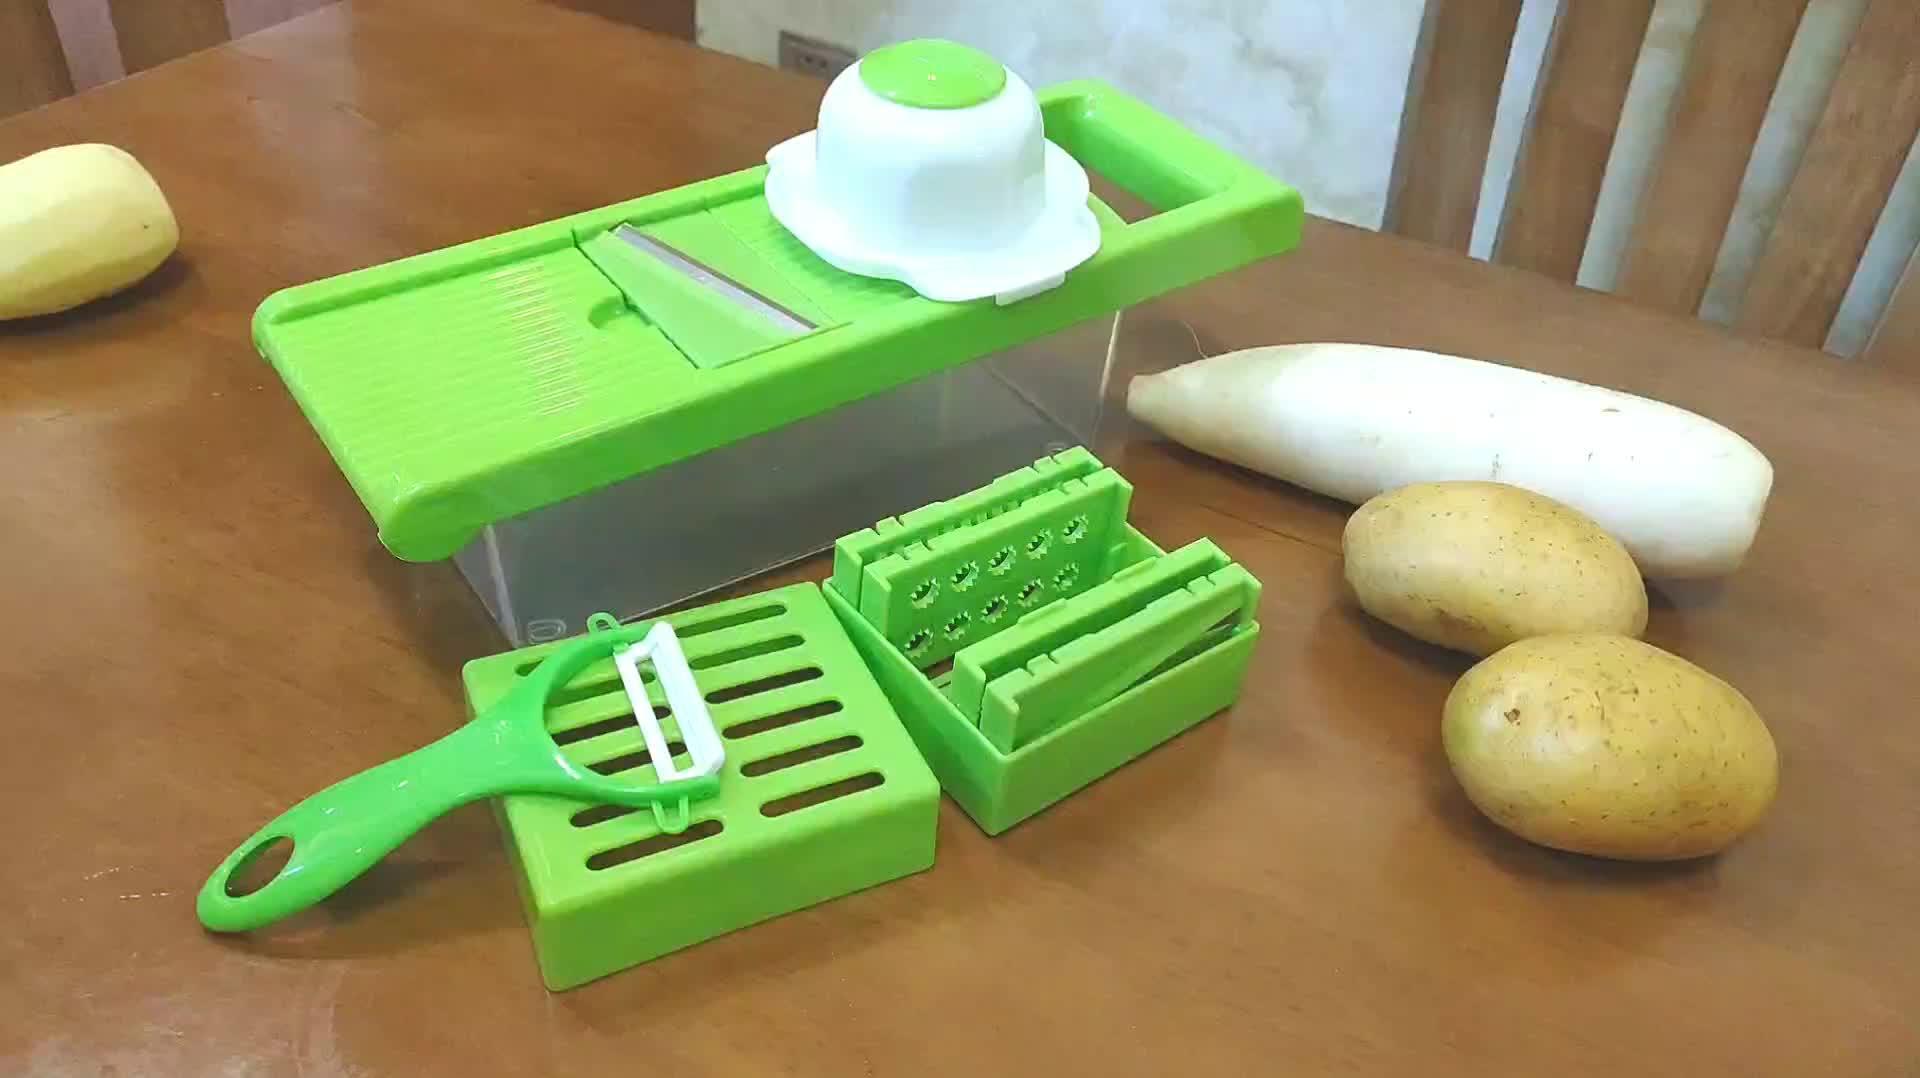 YF Multi Purpose Kitchen Accessories Manual Vegetable Chopper Garlic Onion Dicer Vegetable Slicer Cutter